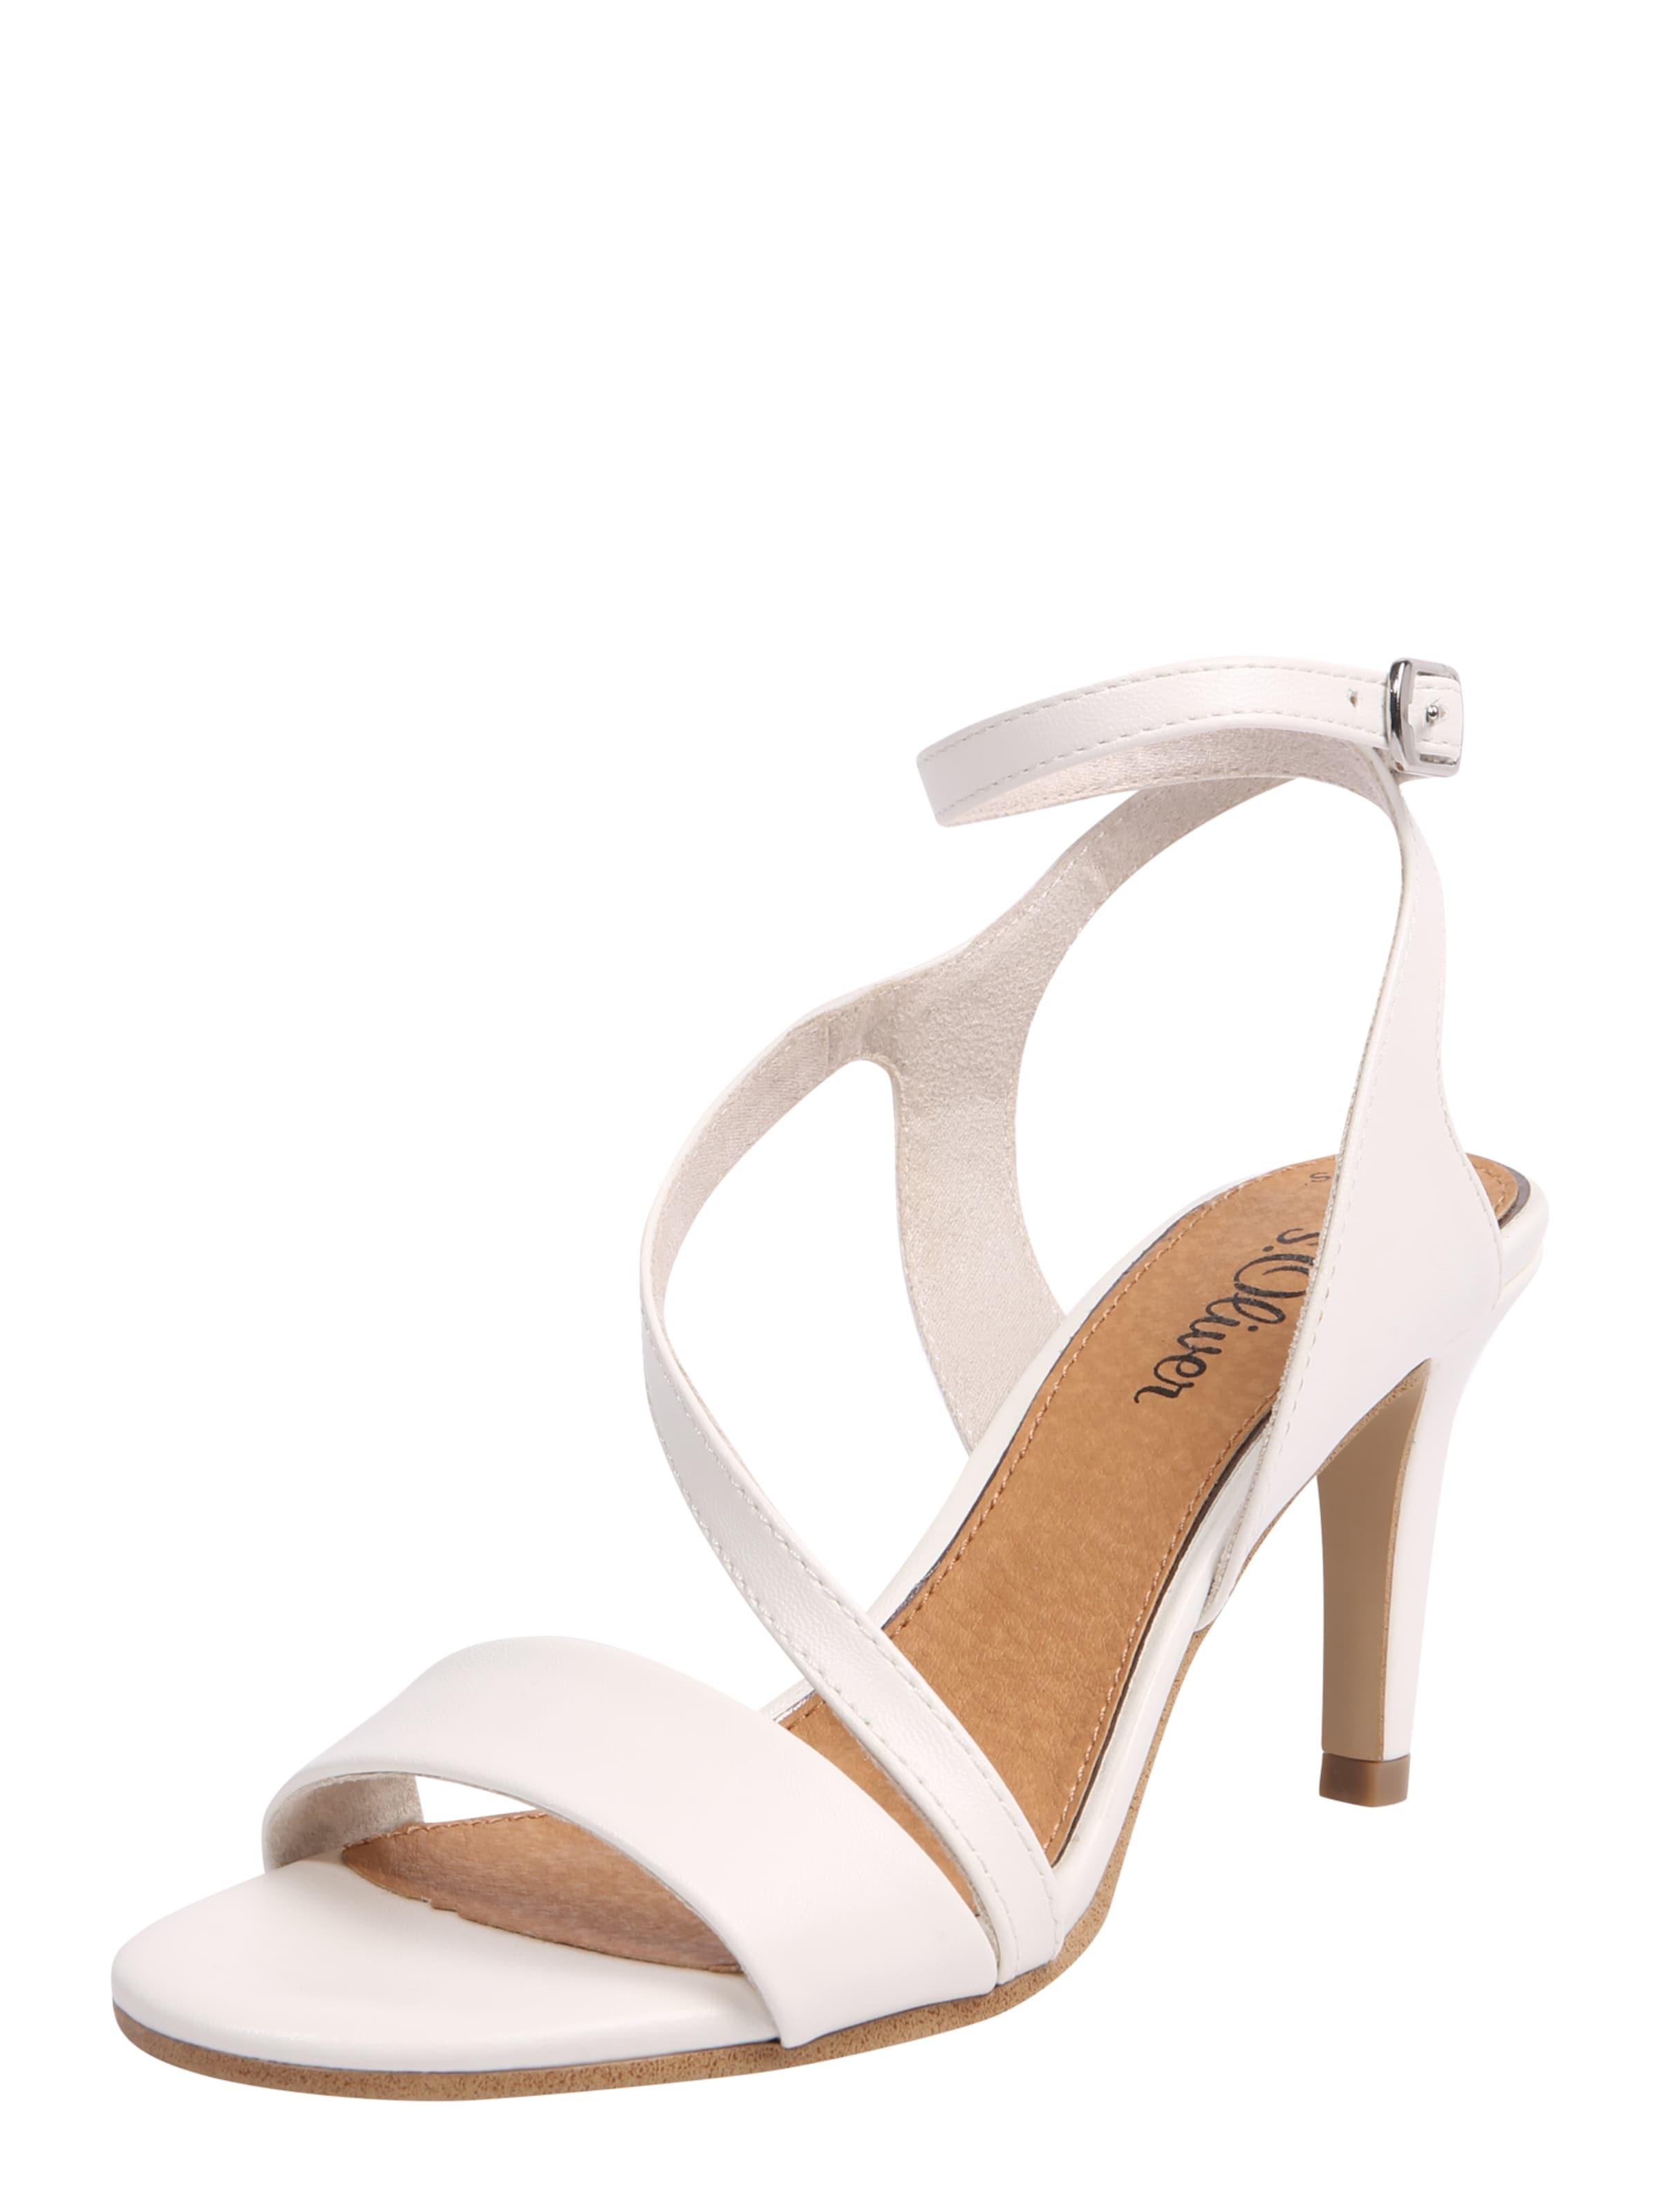 s.Oliver RED Schuhe LABEL Sandalette Verschleißfeste billige Schuhe RED bb3c5c